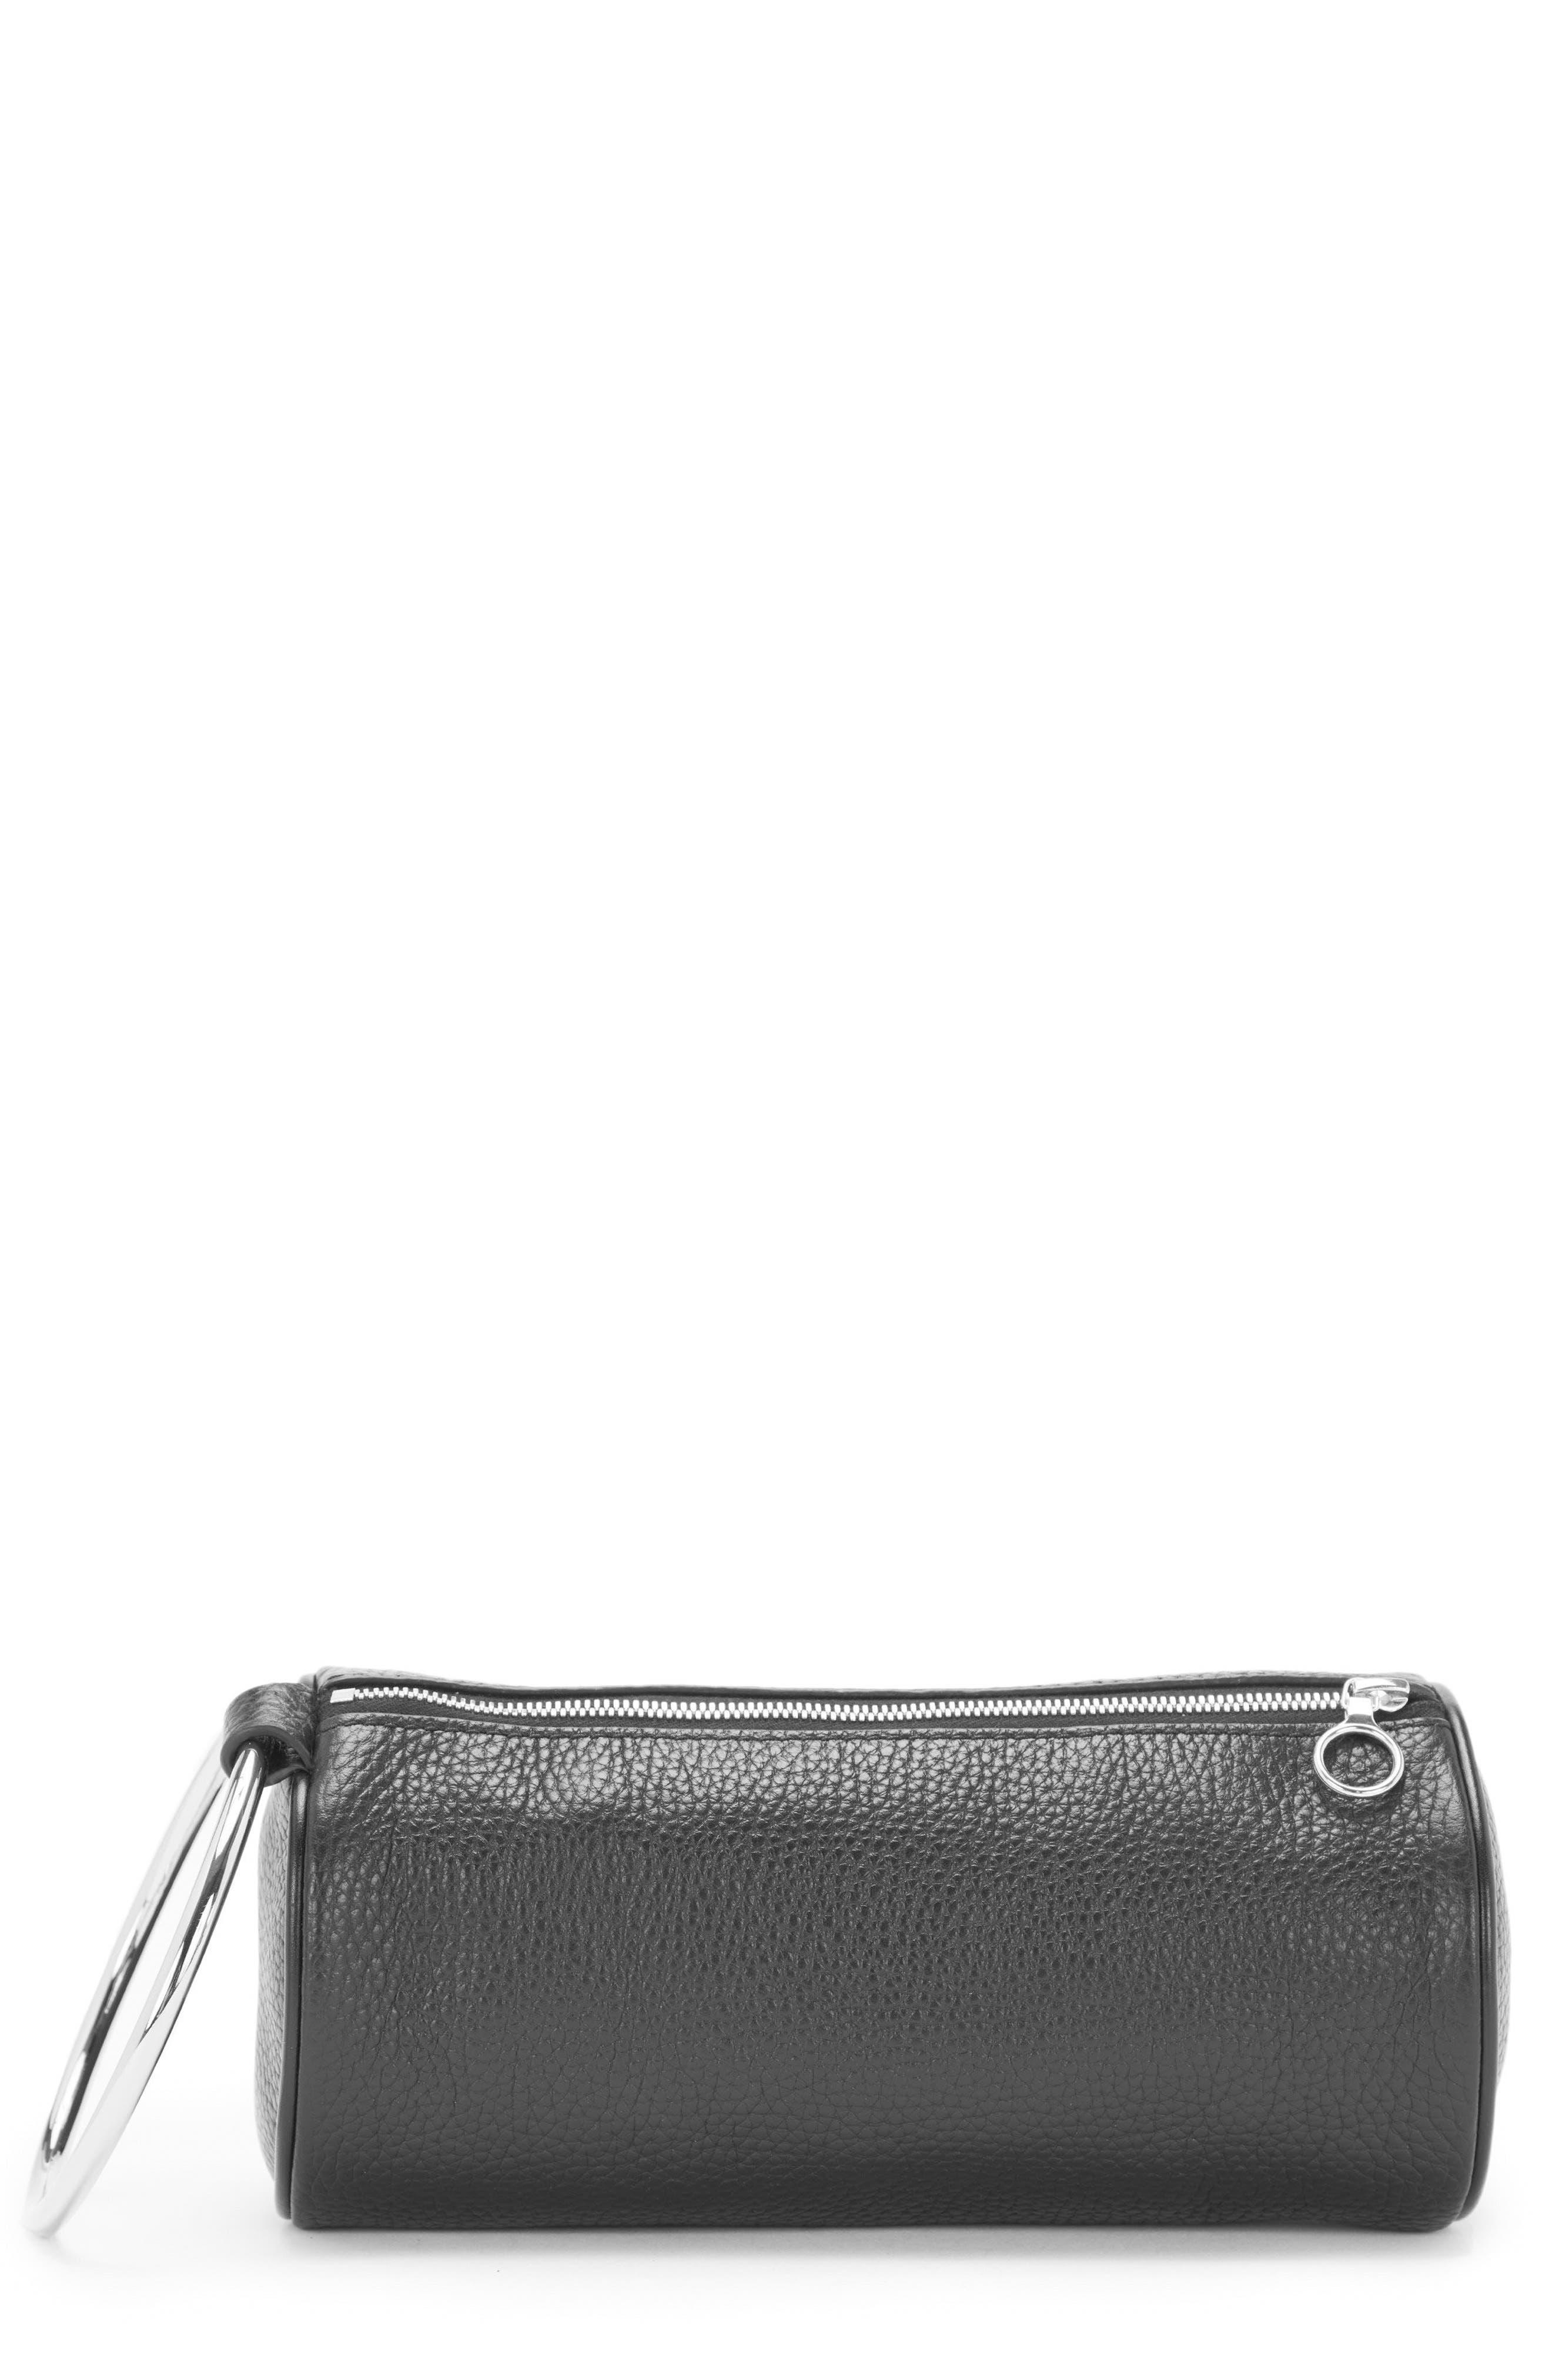 Pebbled Leather Duffel Wristlet Clutch,                             Main thumbnail 1, color,                             001